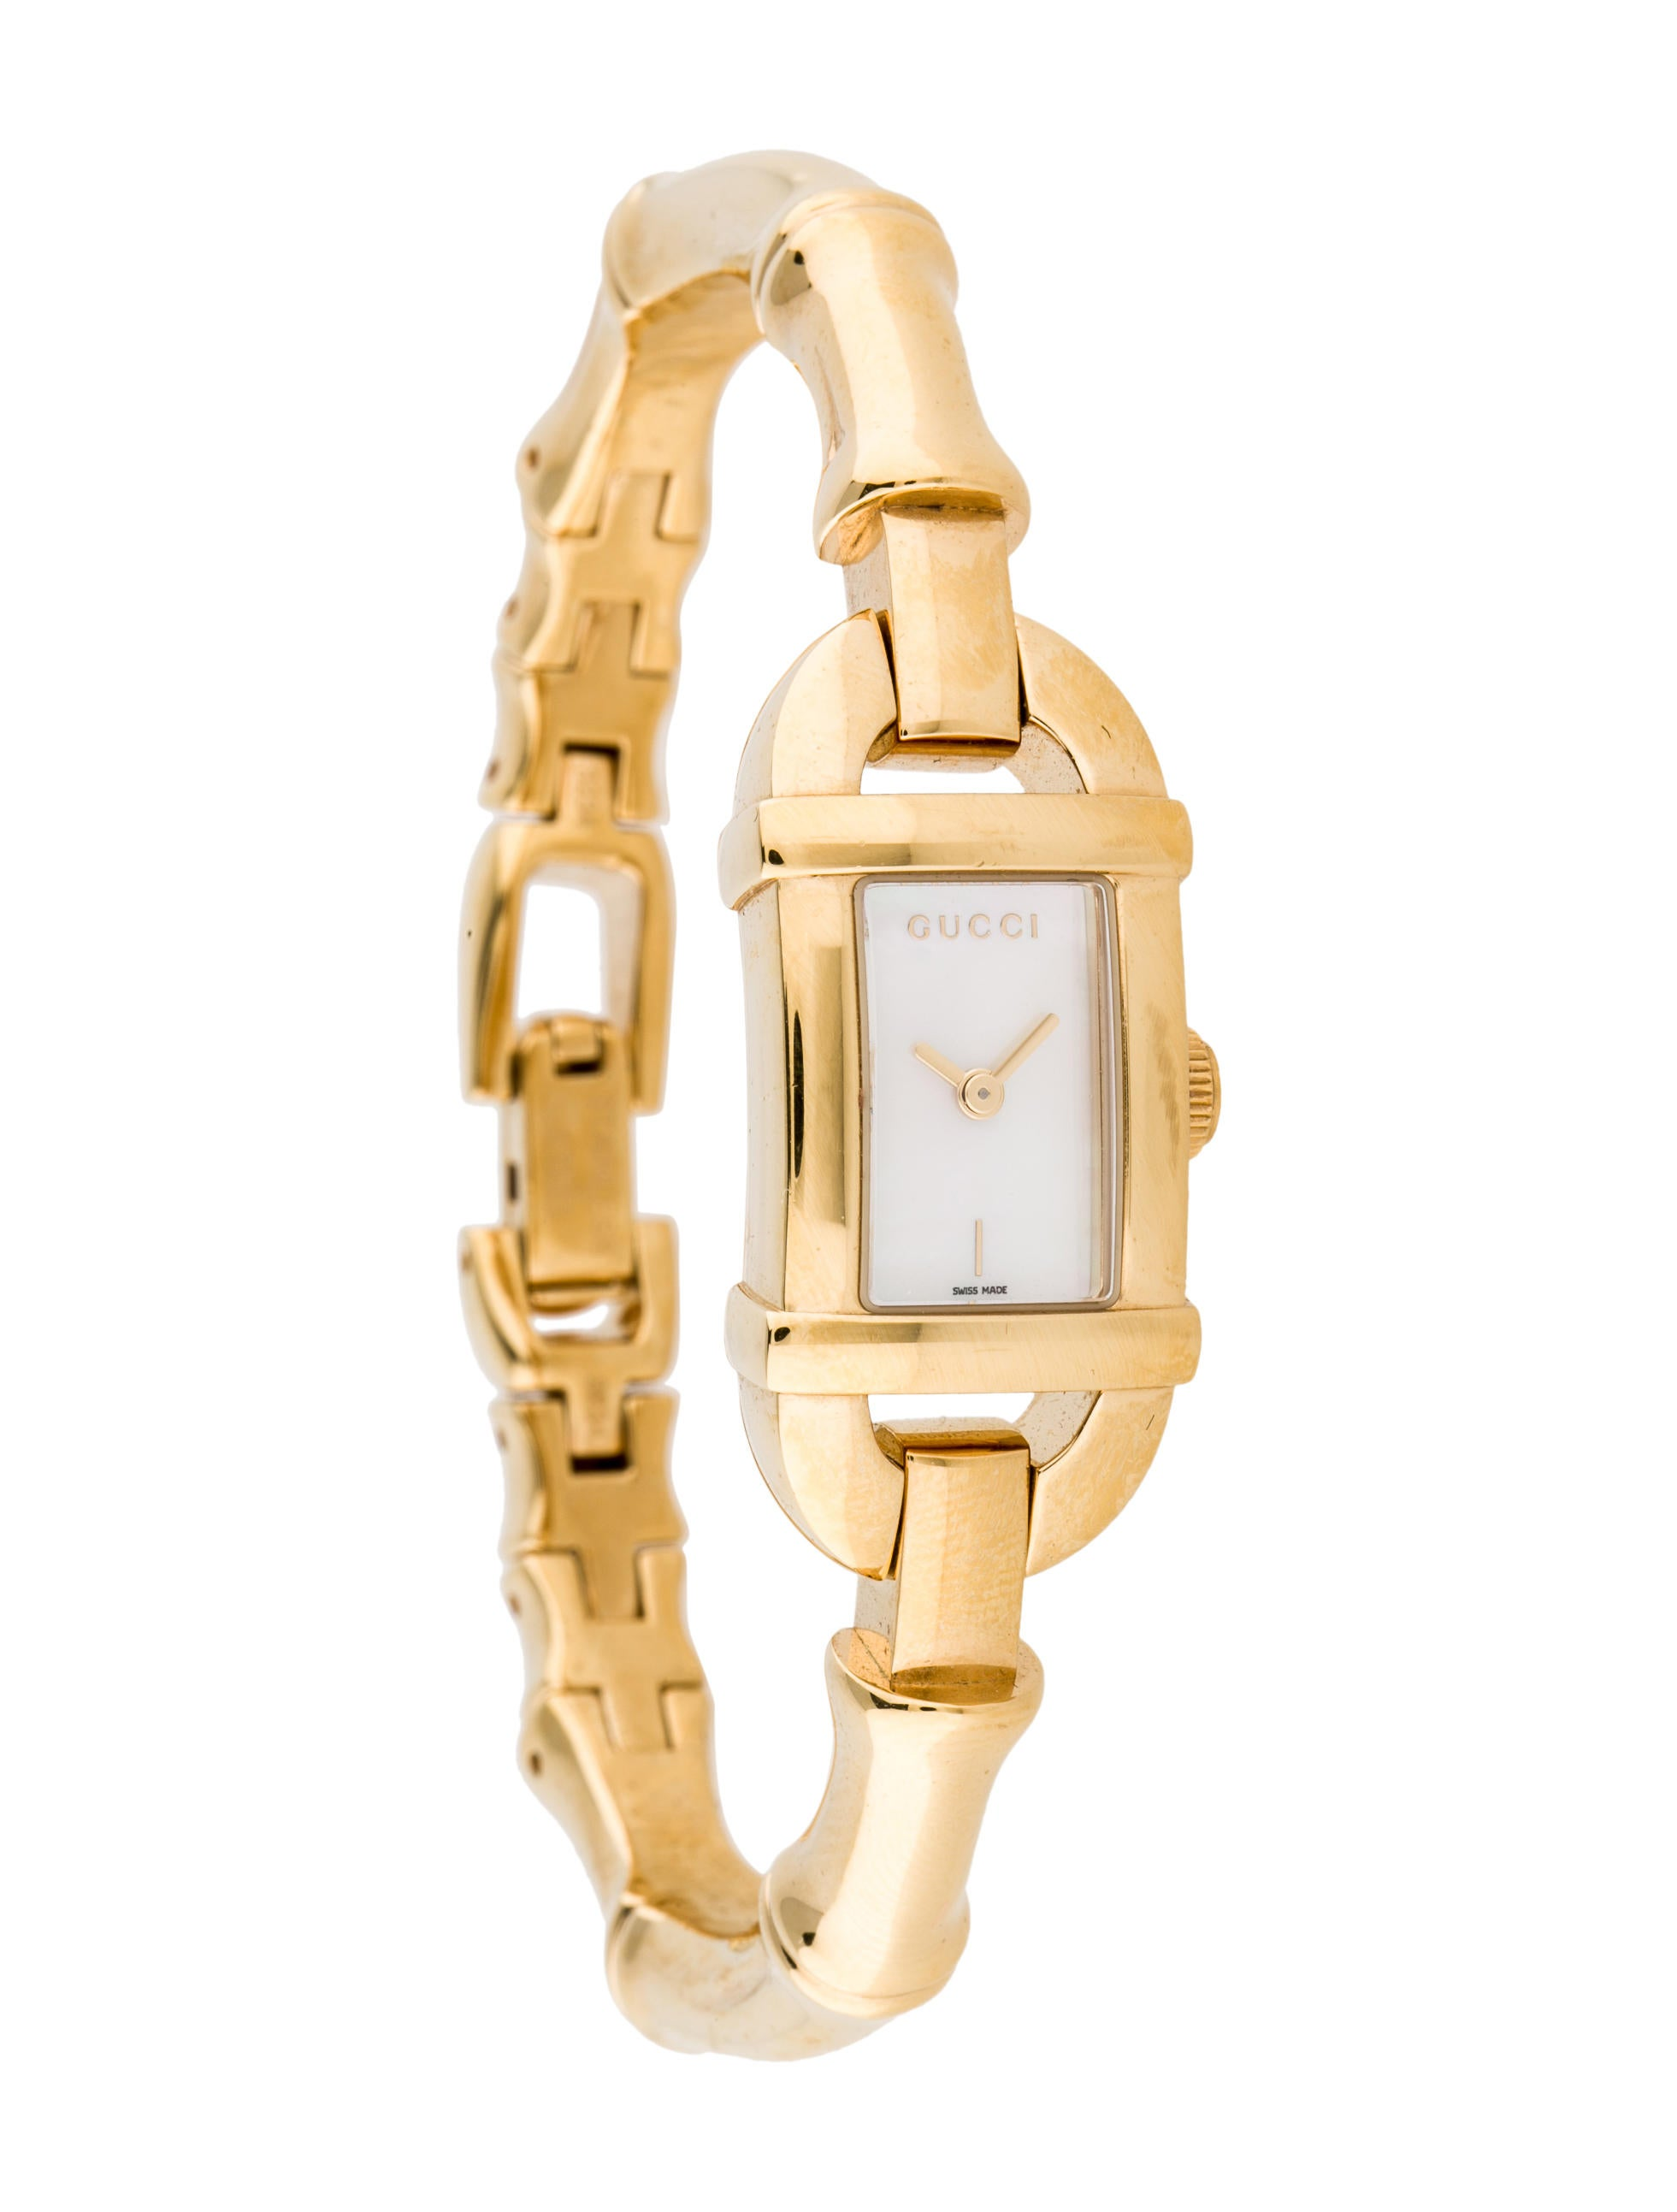 cfdcb6ed45d Gucci Bamboo 6800L Watch - Bracelet - GUC54837